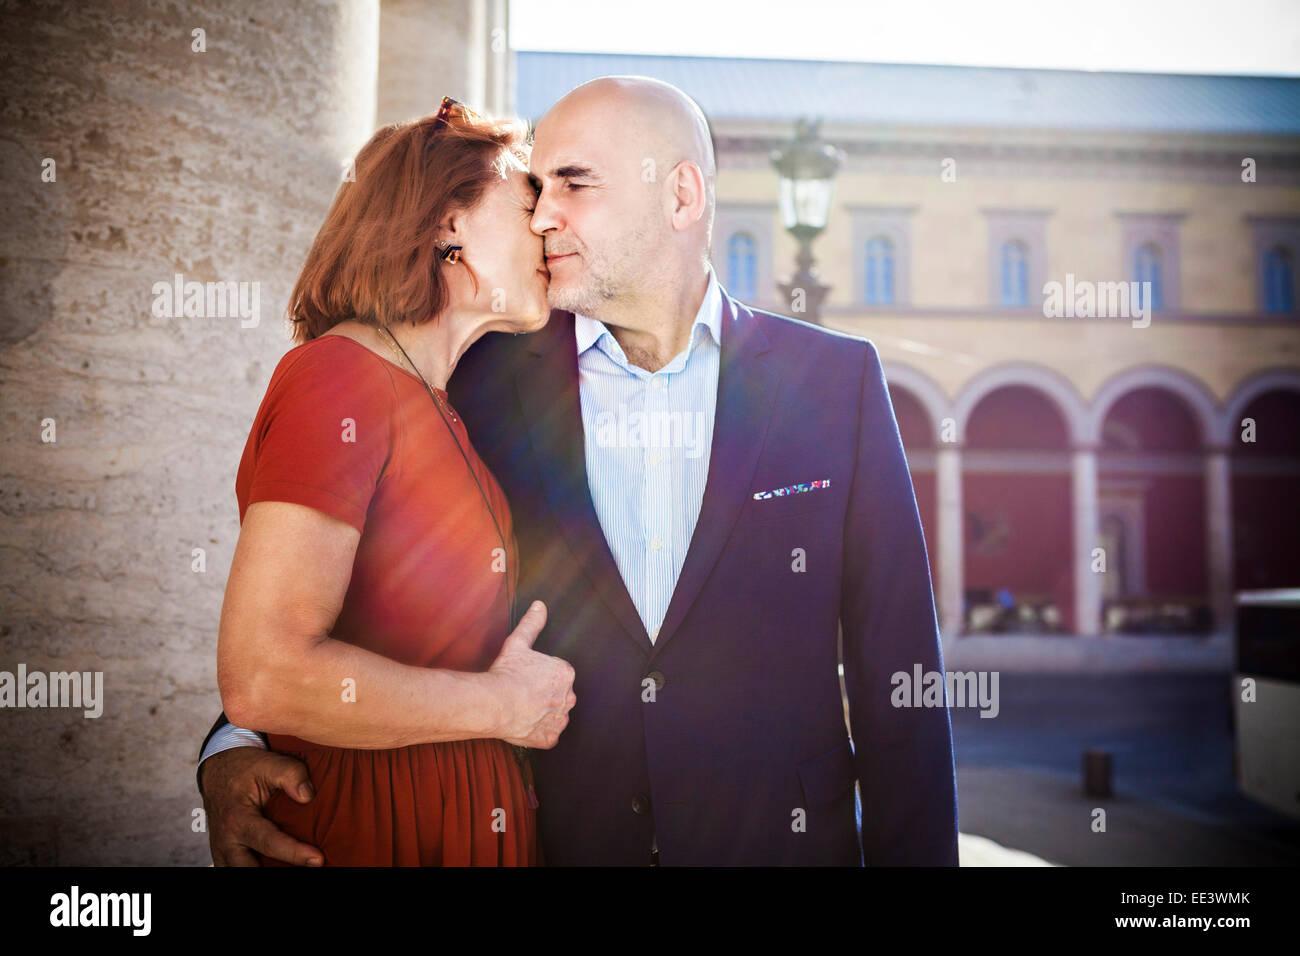 Senior couple kissing tenderly, Munich, Bavaria, Germany Stock Photo